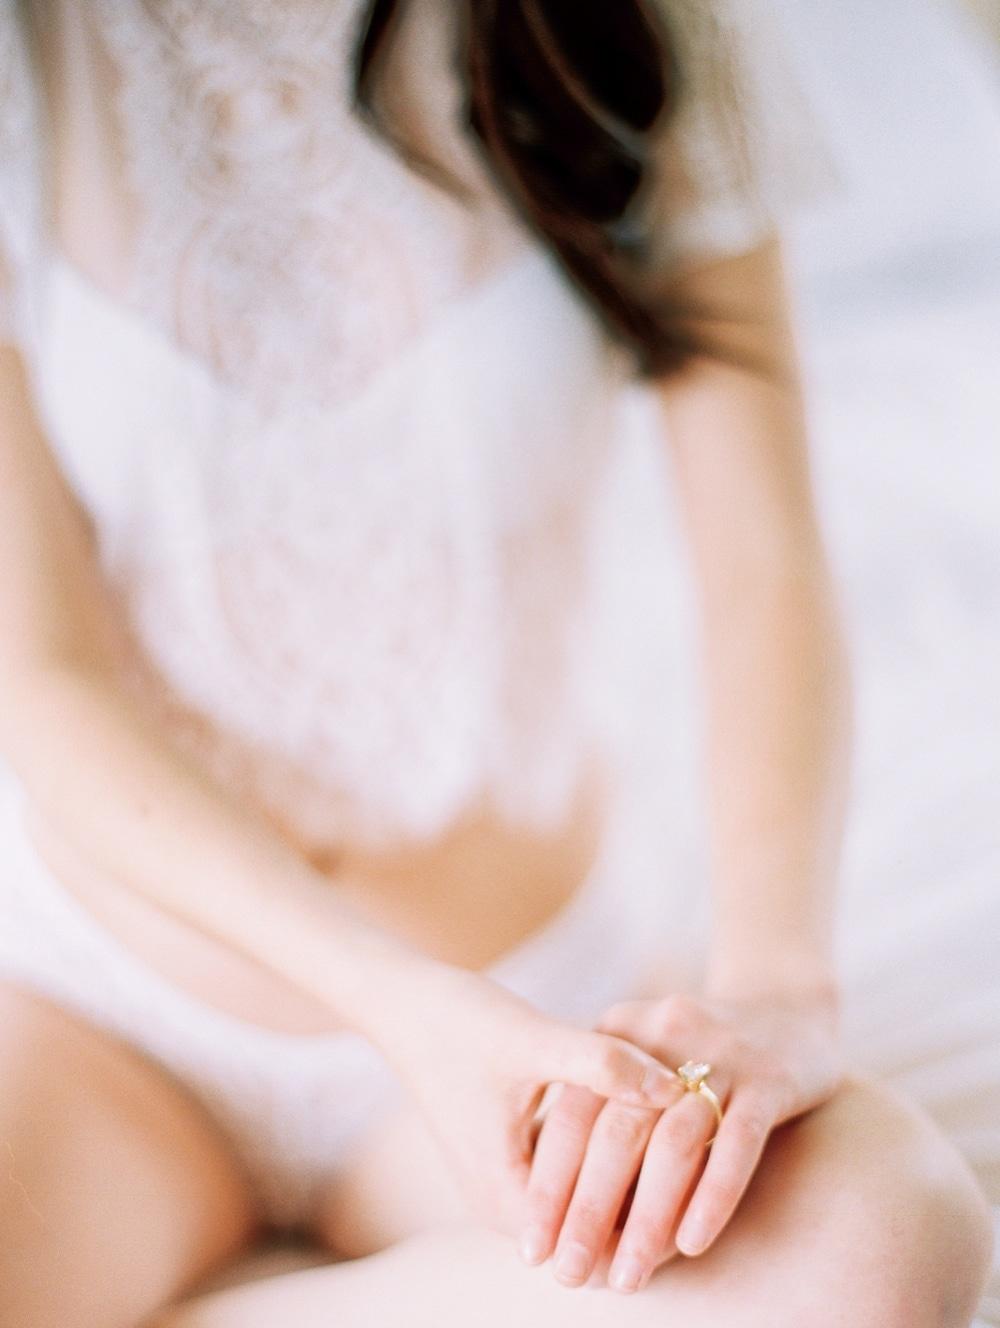 Kristin-La-Voie-Photography-fine-art-wedding-bridal-boudoir-texas-photographer-Dallas-Austin-San-Marcos-wahwahtaysee-resort-114